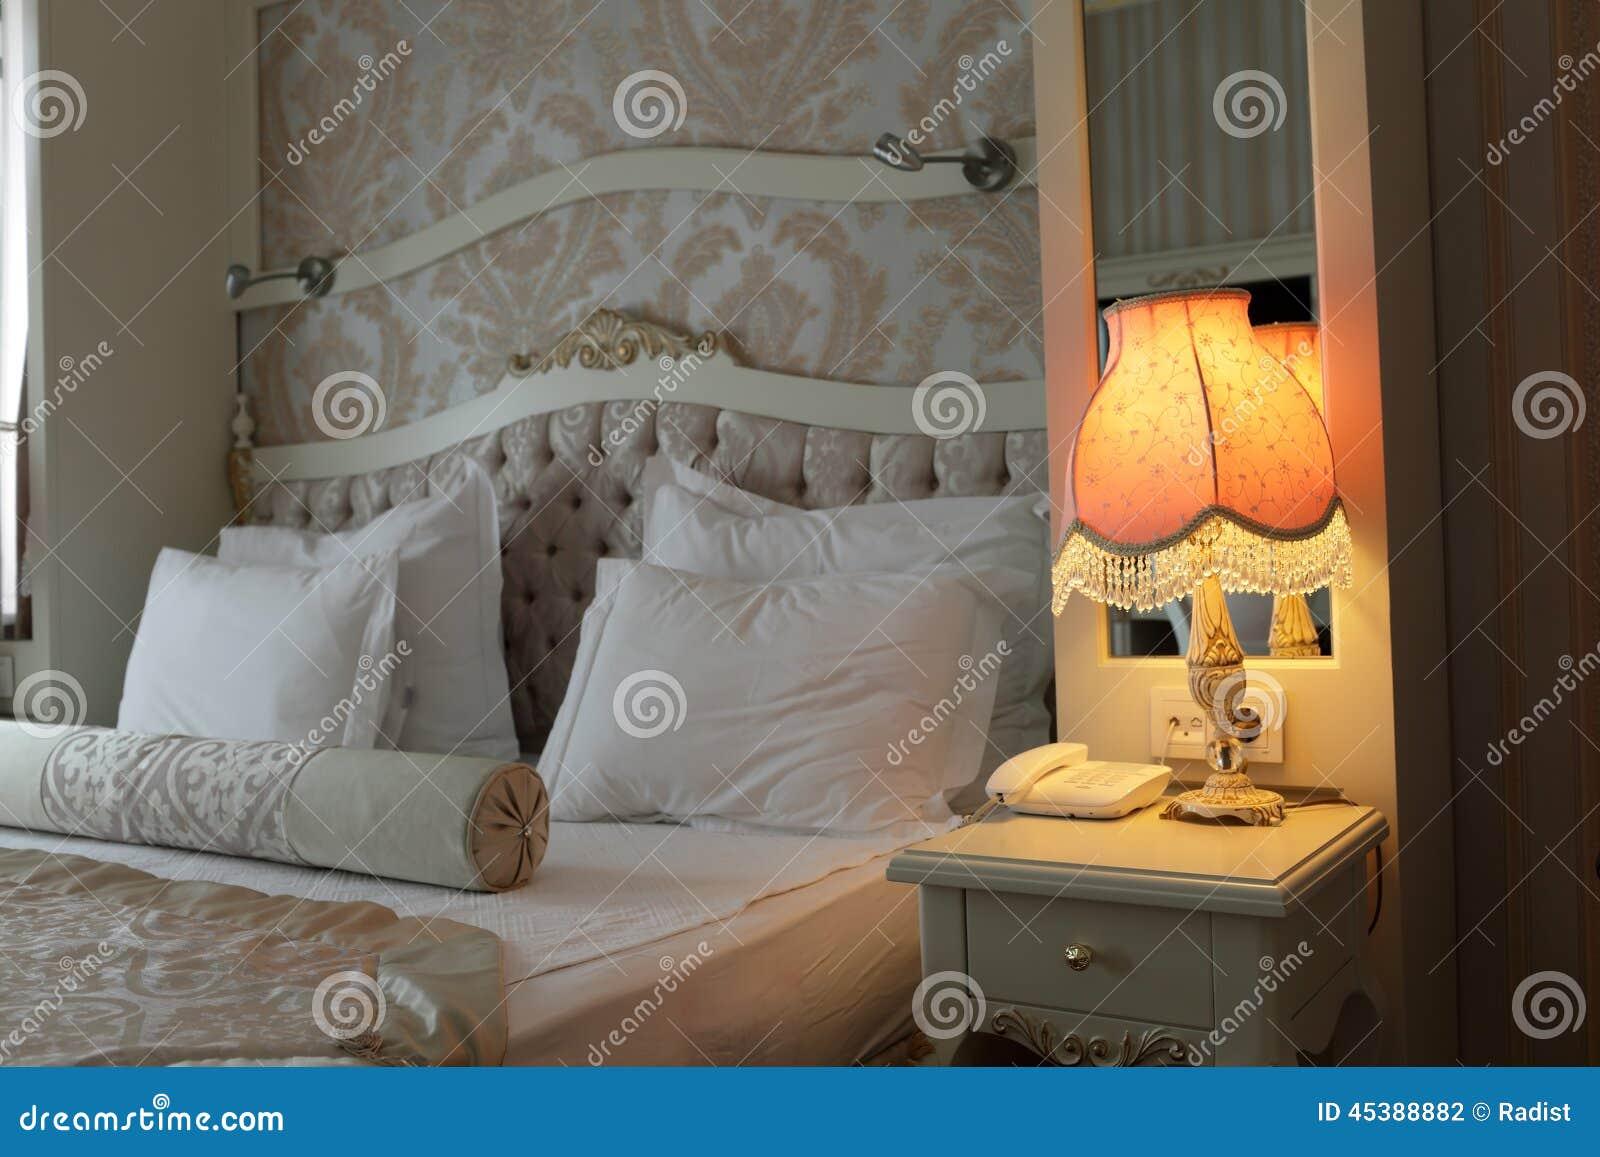 Lampa i sovrum arkivfoto   bild: 45388882